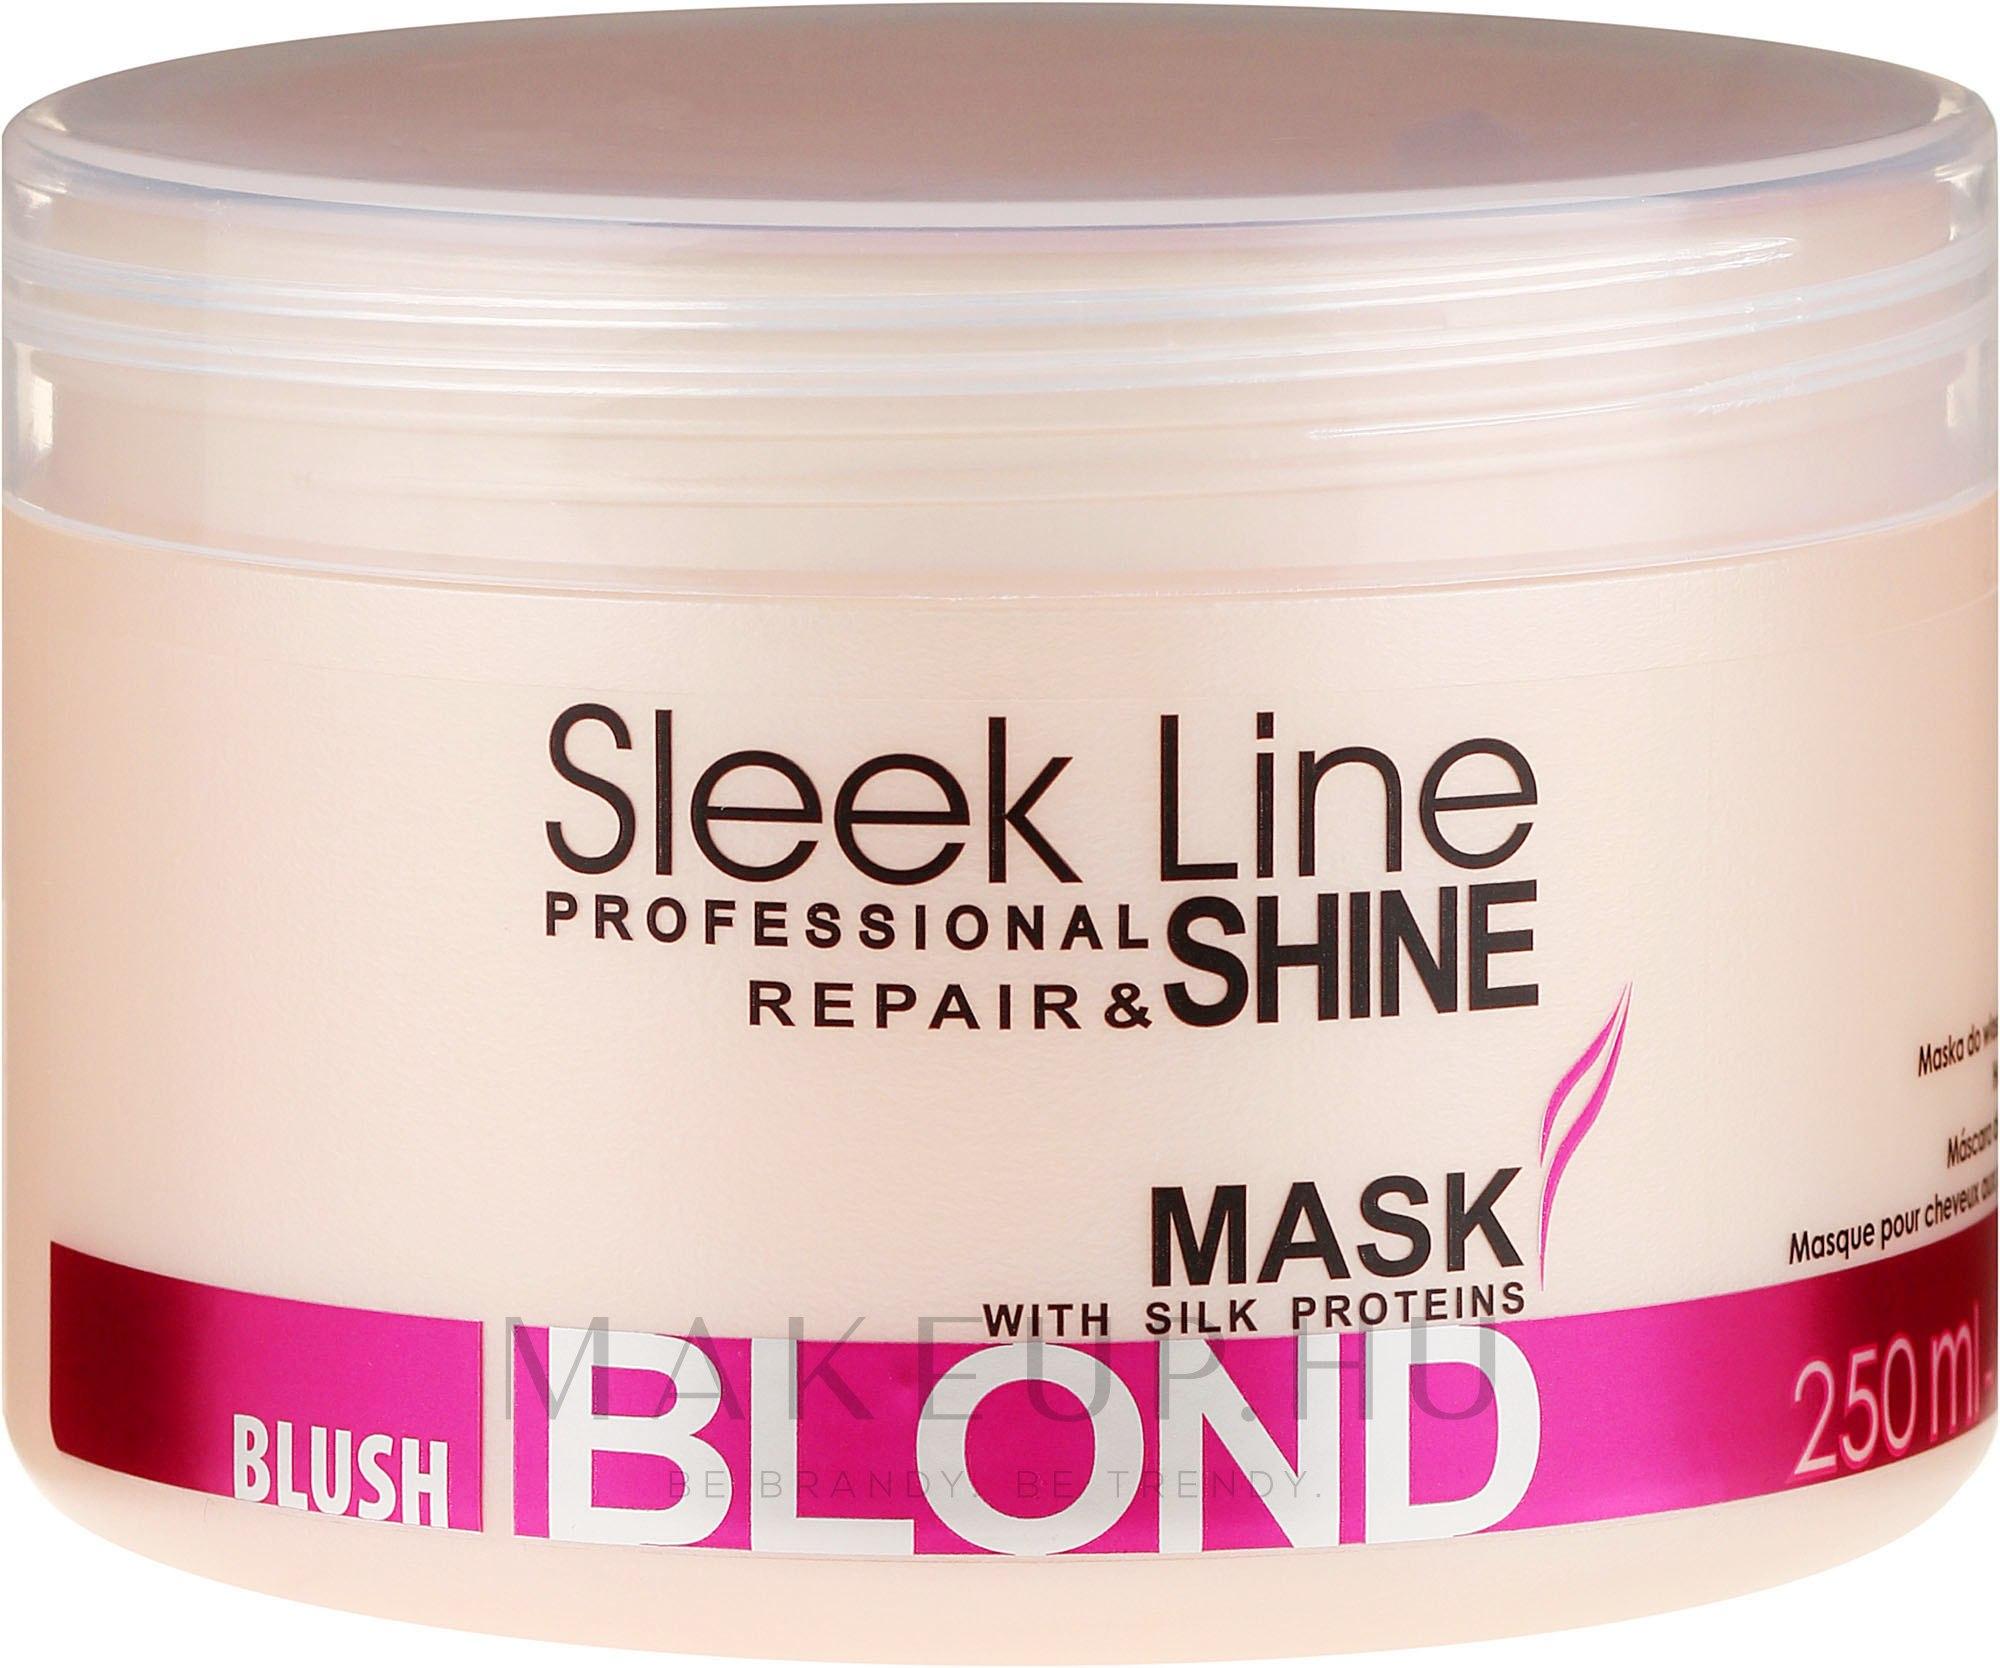 Hajmaszk - Stapiz Sleek Line Blush Blond Mask — fotó 250 ml